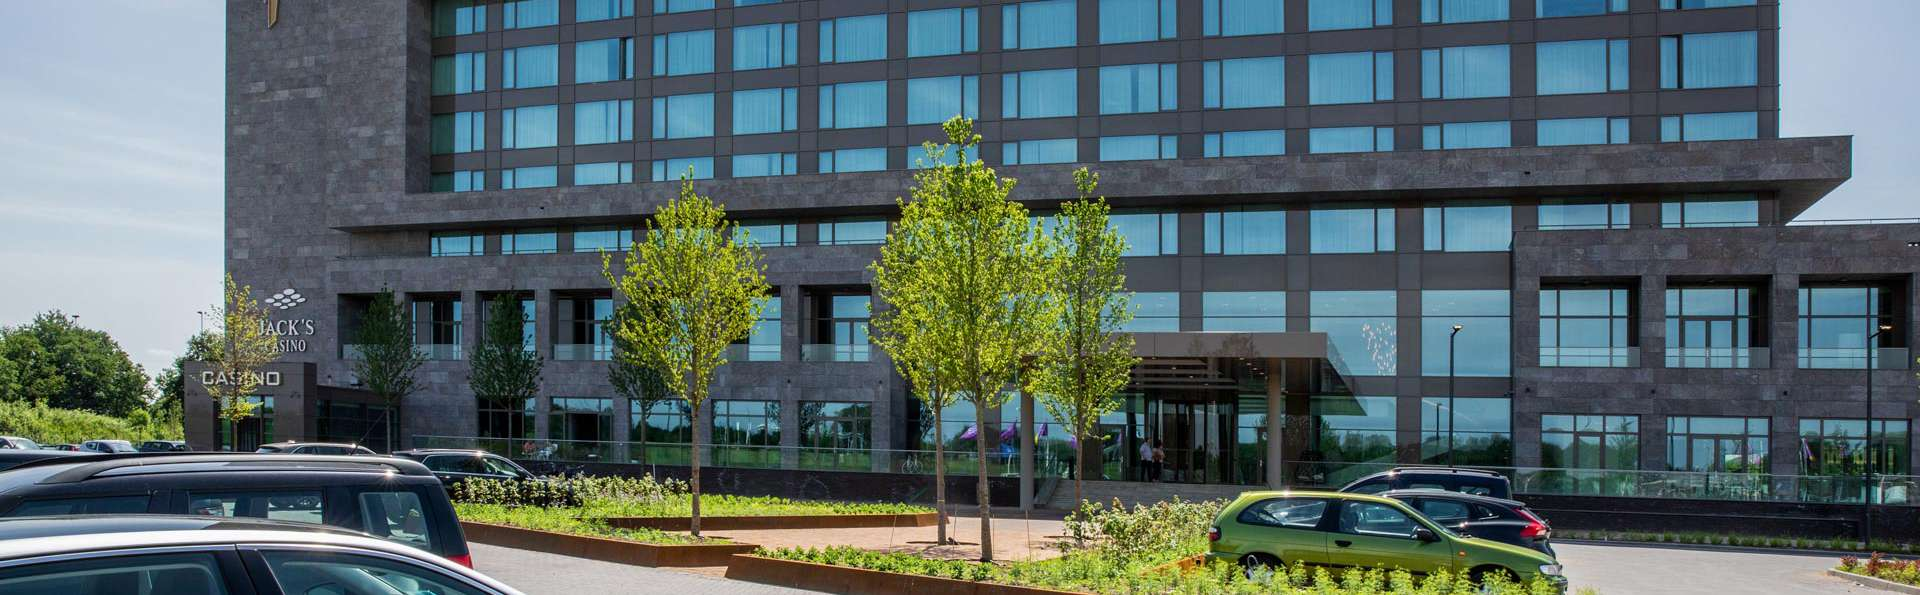 Van der Valk Hotel Tilburg - EDIT_FRONT_02.jpg